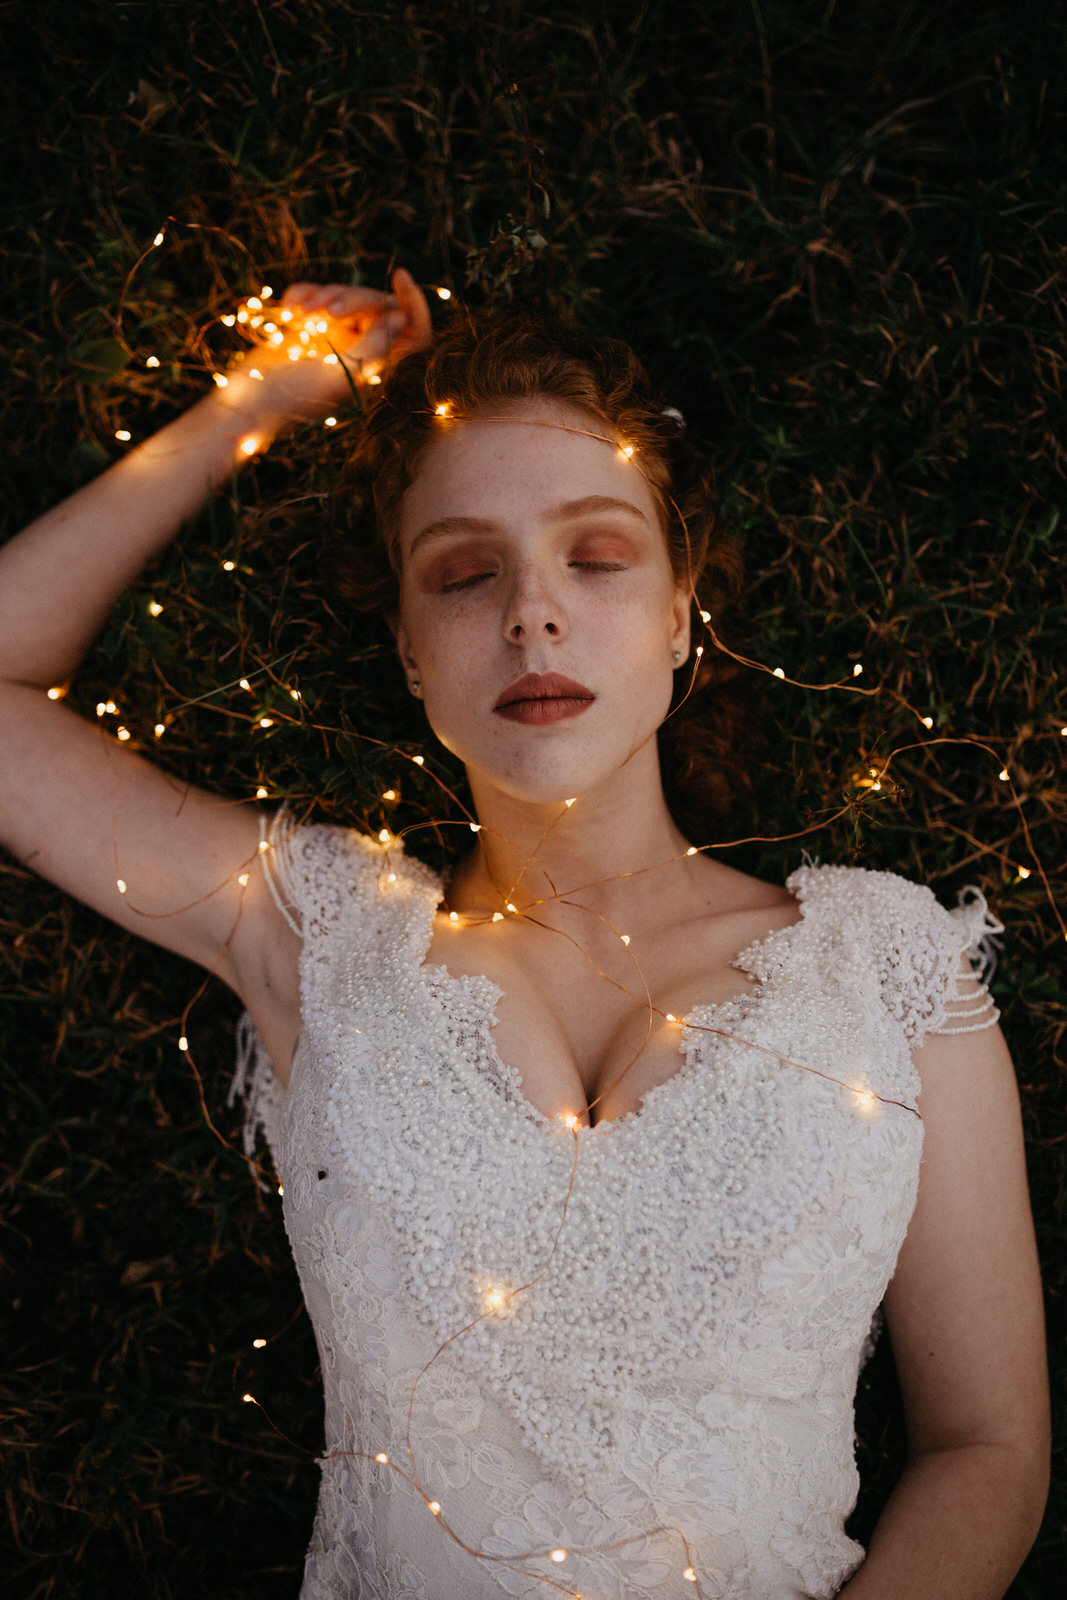 Céu_fotografia_casamentos_goiás_brasil_folk_noivas_brides_alternativo (73).jpg